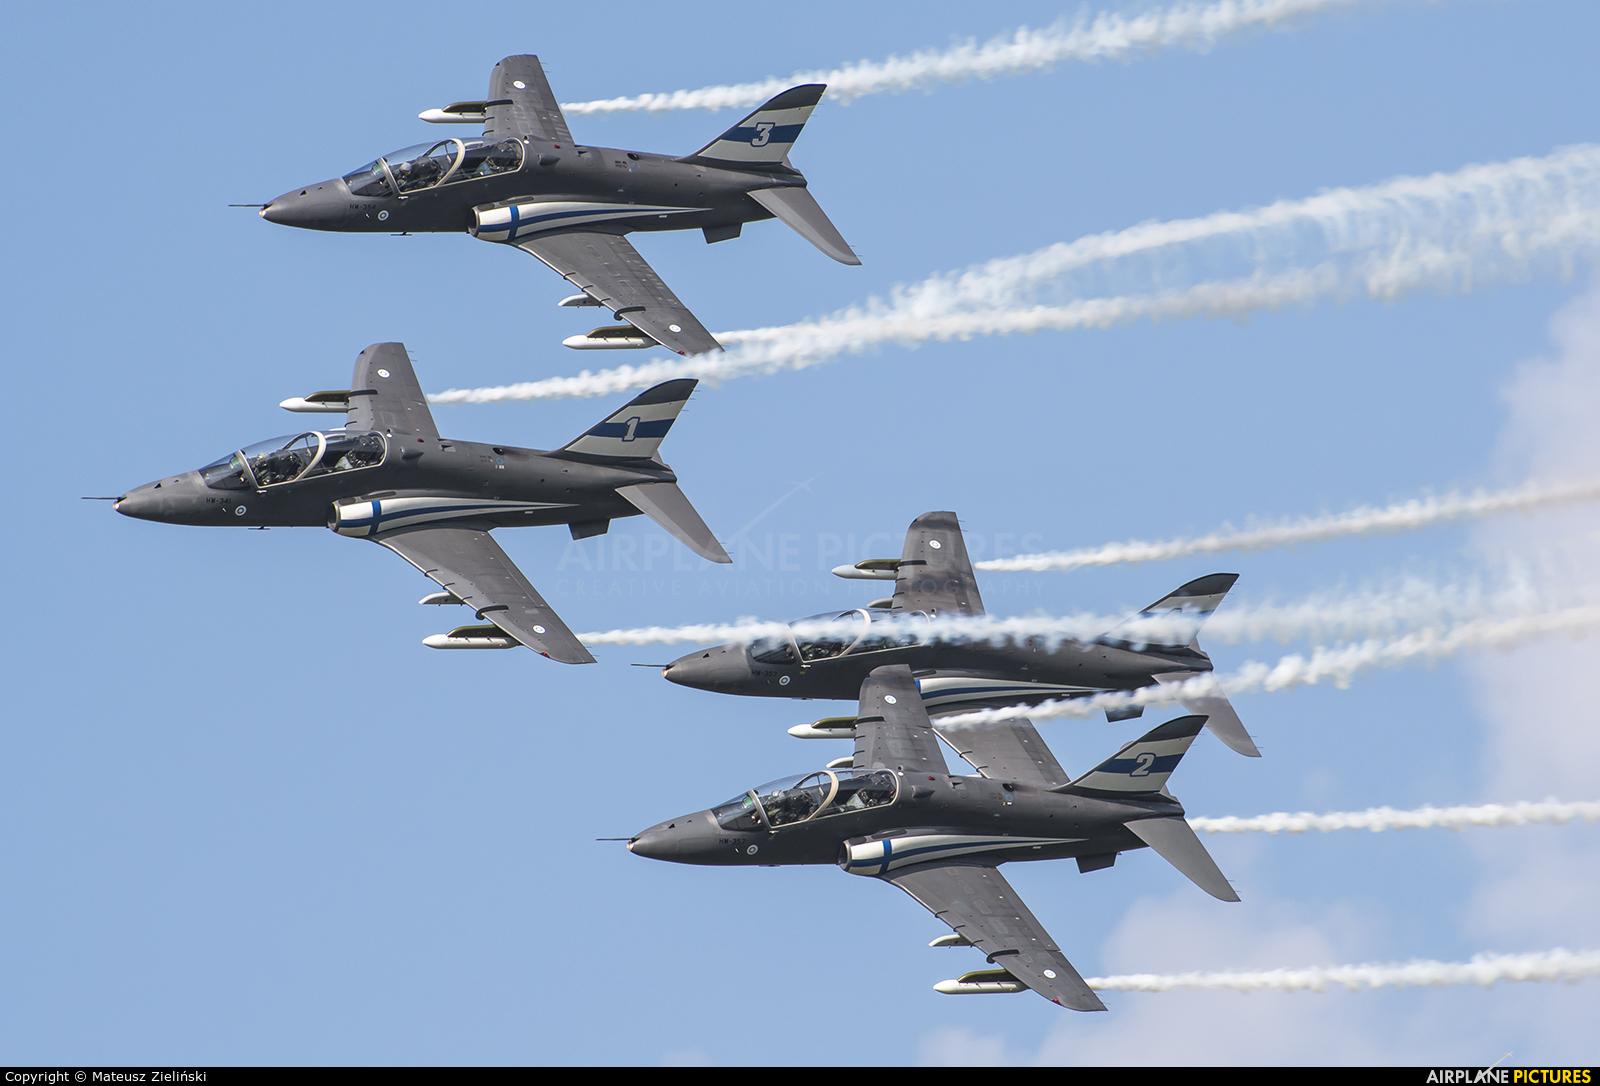 Finland - Air Force: Midnight Hawks HW-341 aircraft at Radom - Sadków